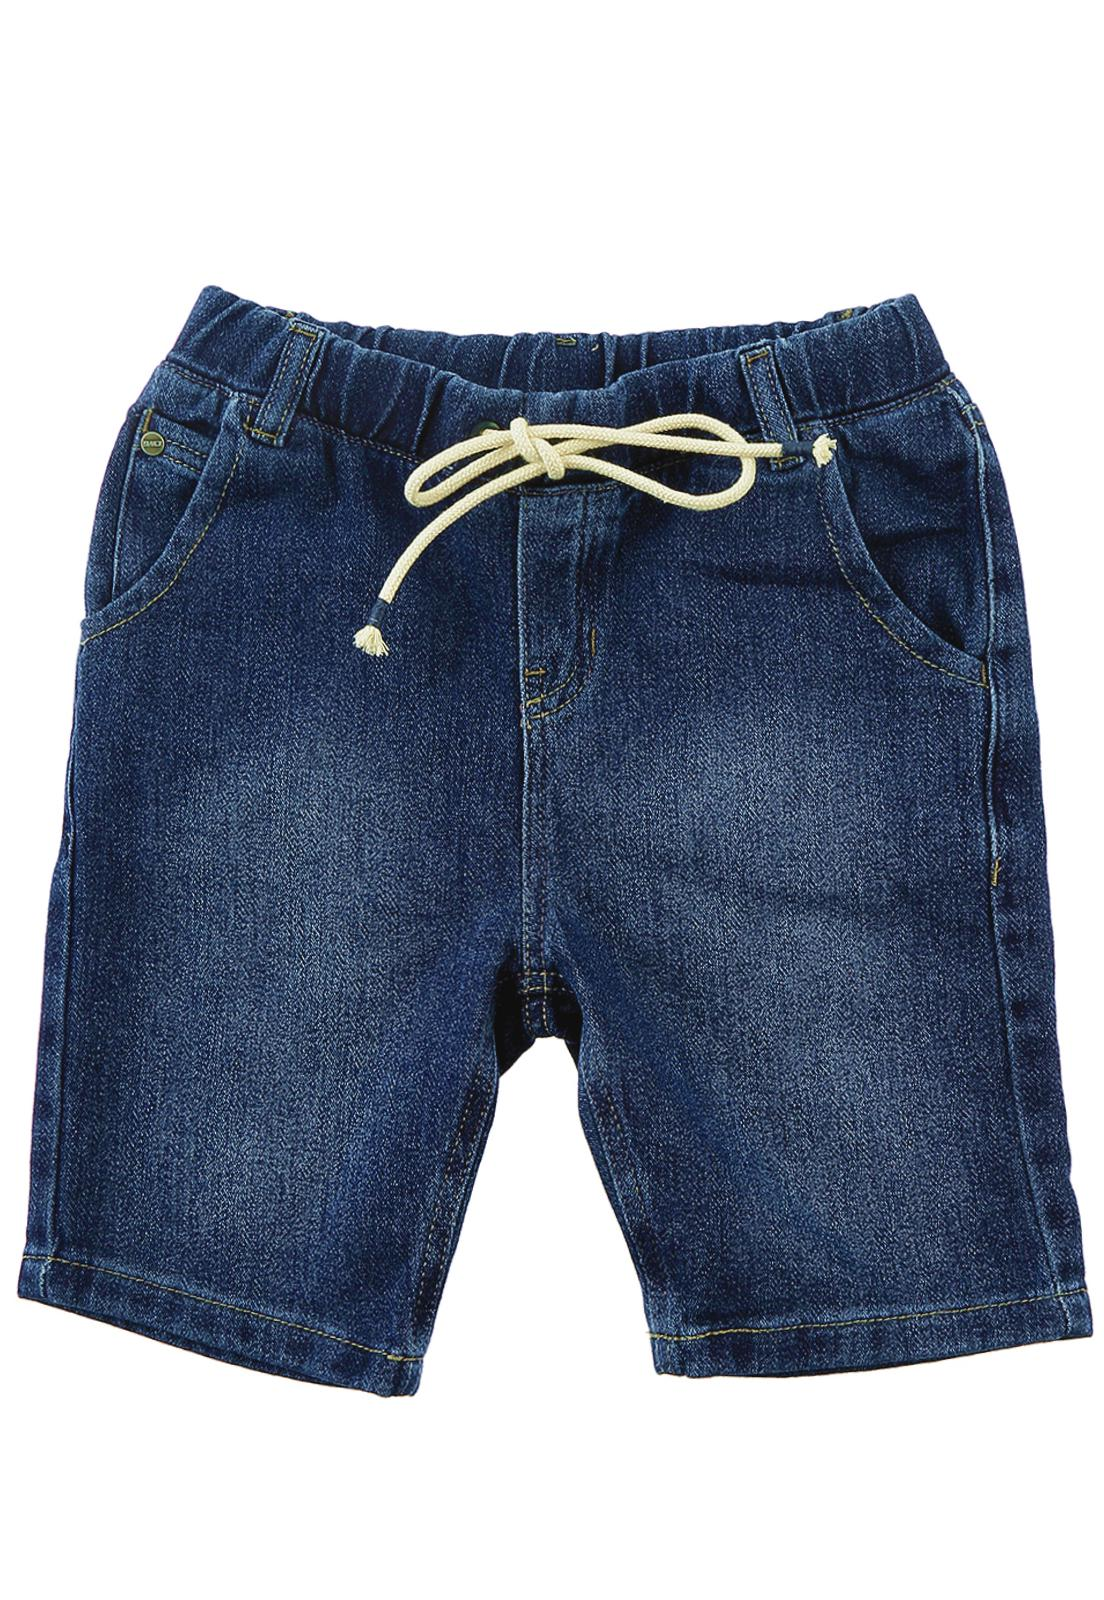 Bermuda Jogger Jeans Moletom Masculina